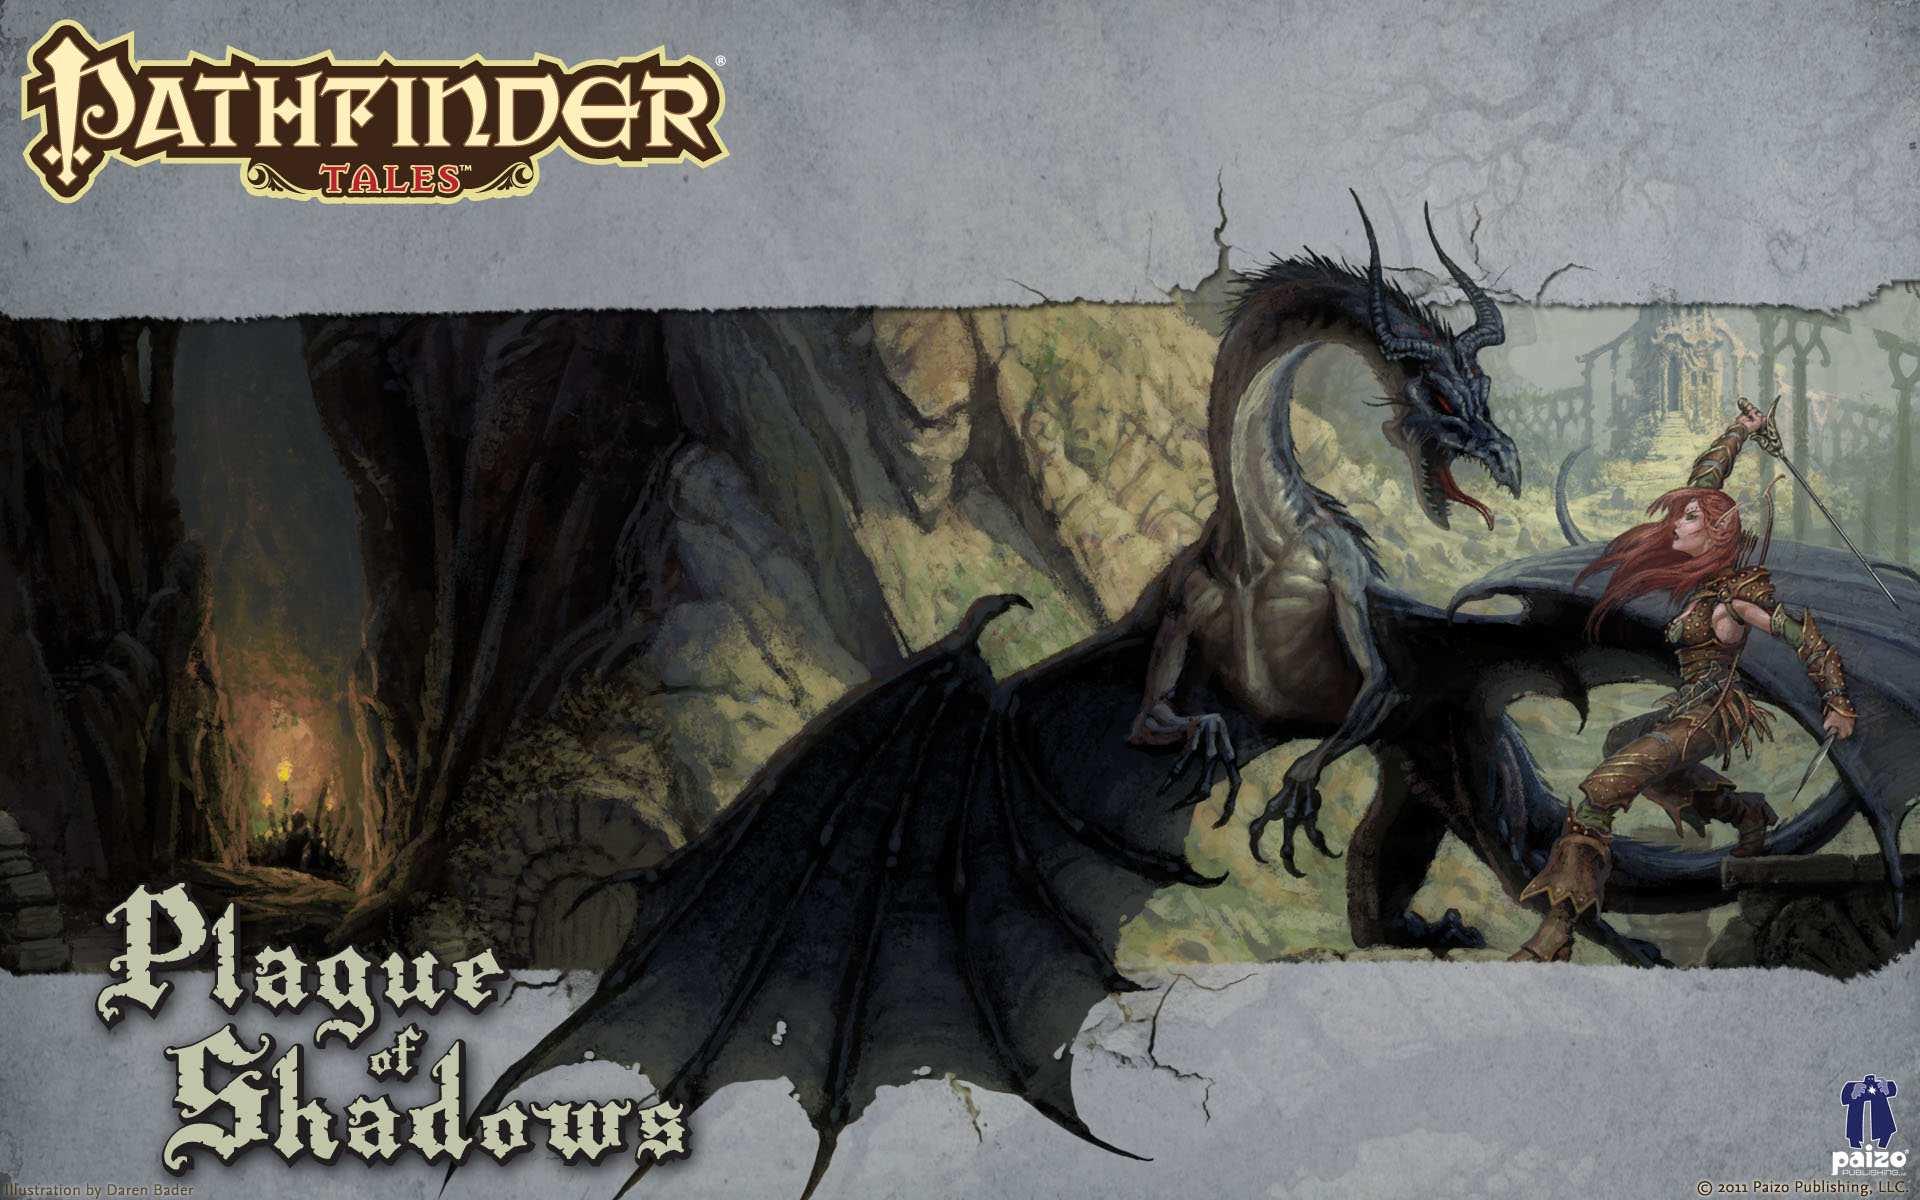 Pathfinder Rpg wallpaper   359205 1920x1200